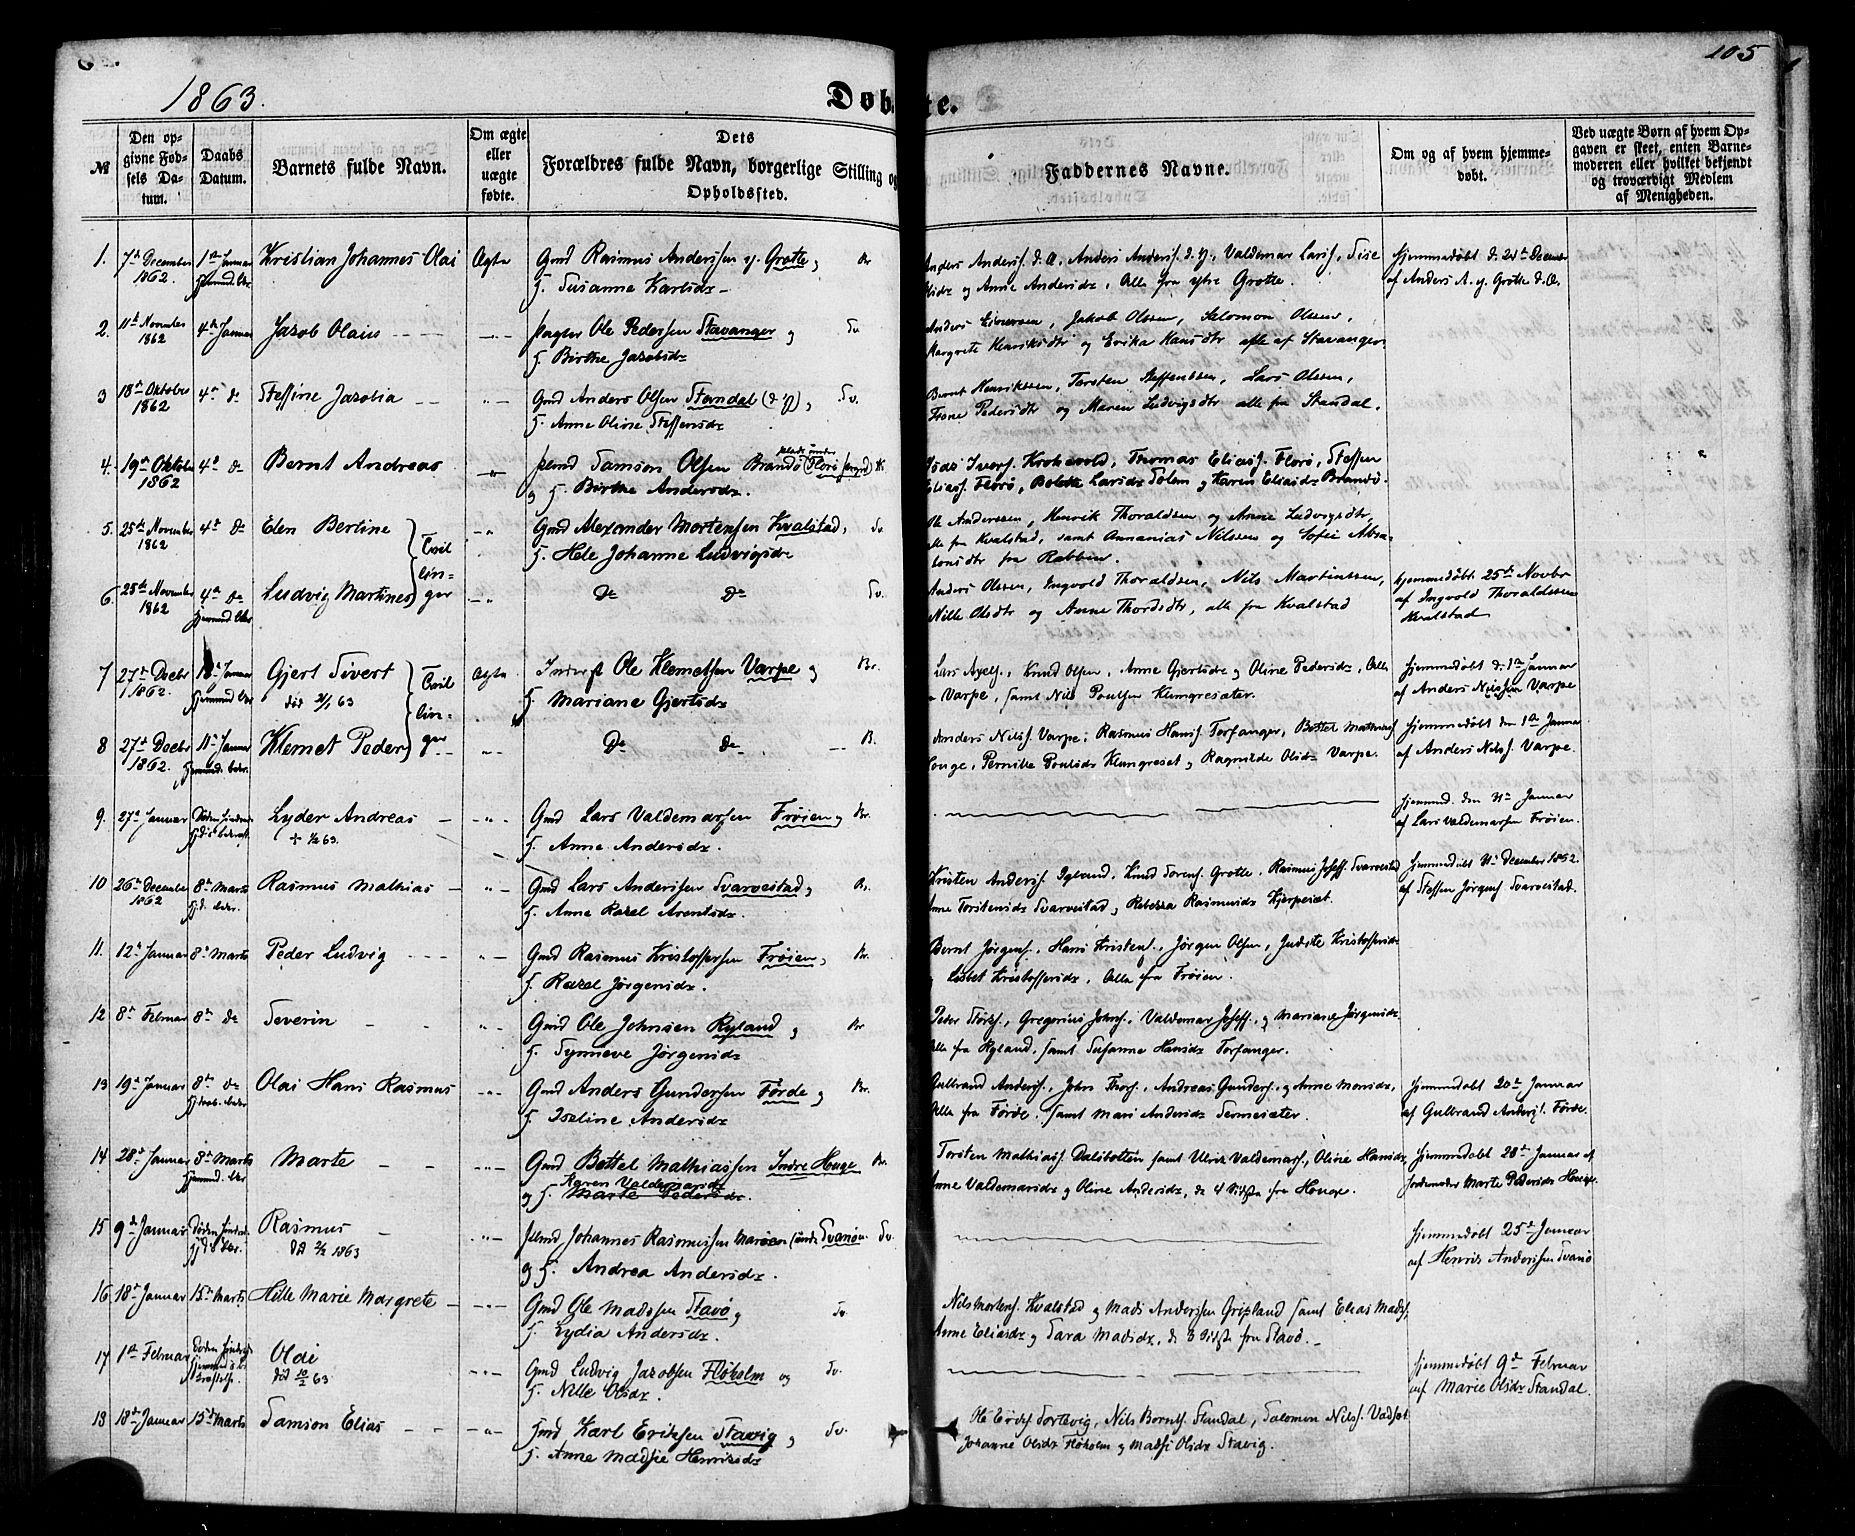 SAB, Kinn sokneprestembete, H/Haa/Haaa/L0006: Parish register (official) no. A 6, 1857-1885, p. 105